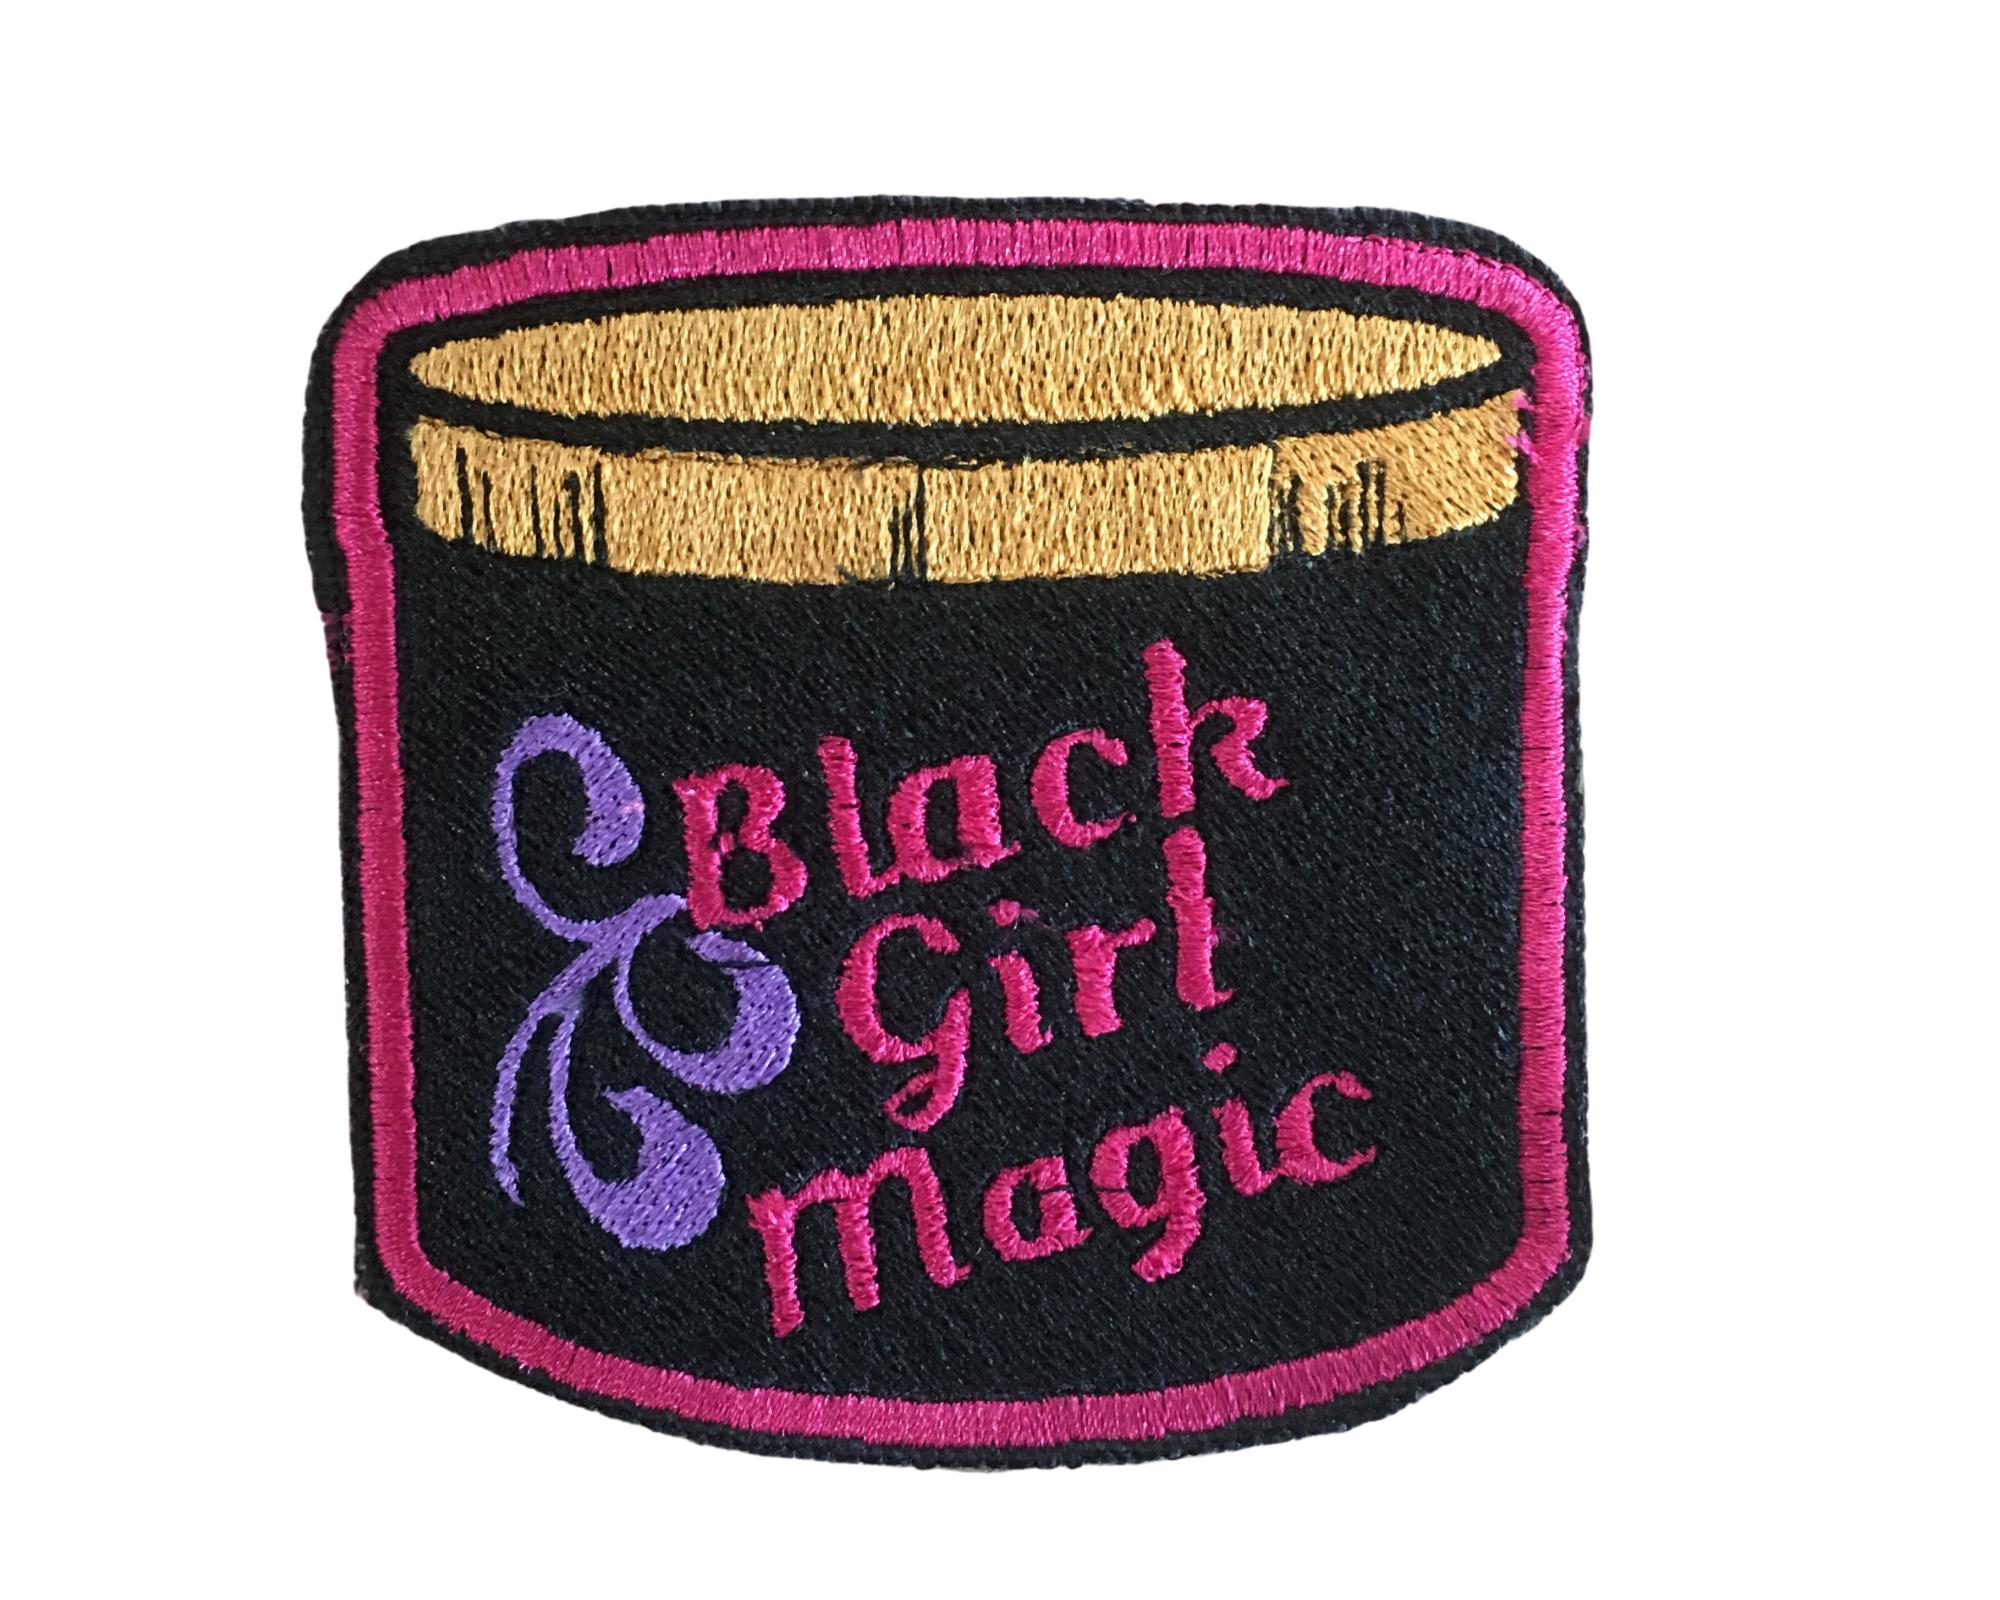 THE SHOP BLACK GIRL MAGIC JAR SMALL PATCH-1